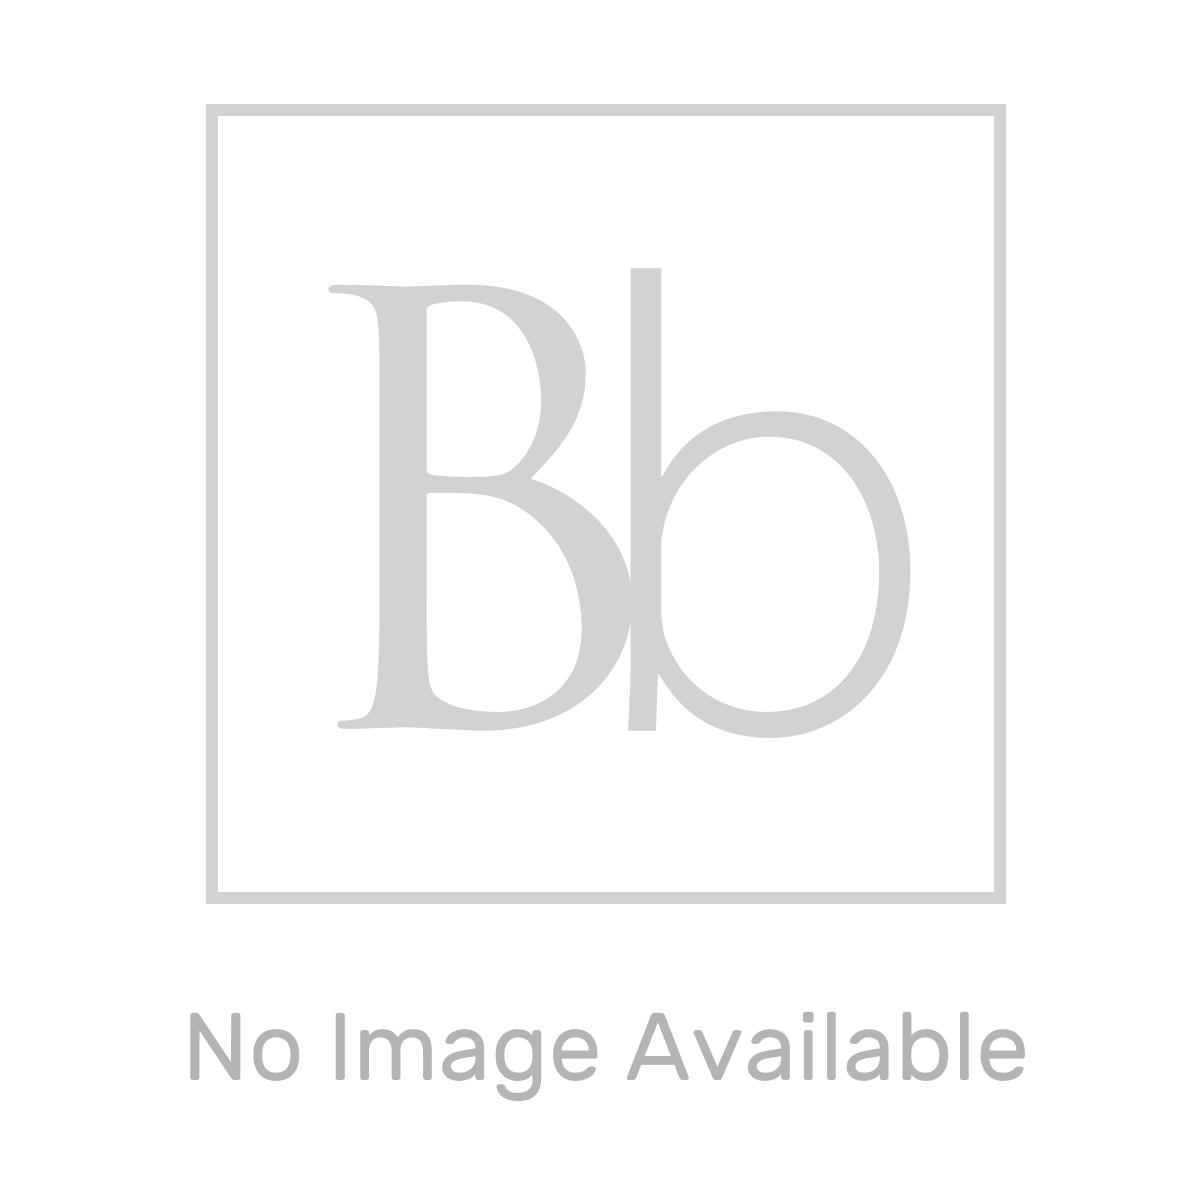 RAK Black Rectangular Ceiling Shower Arm 250mm Measurements